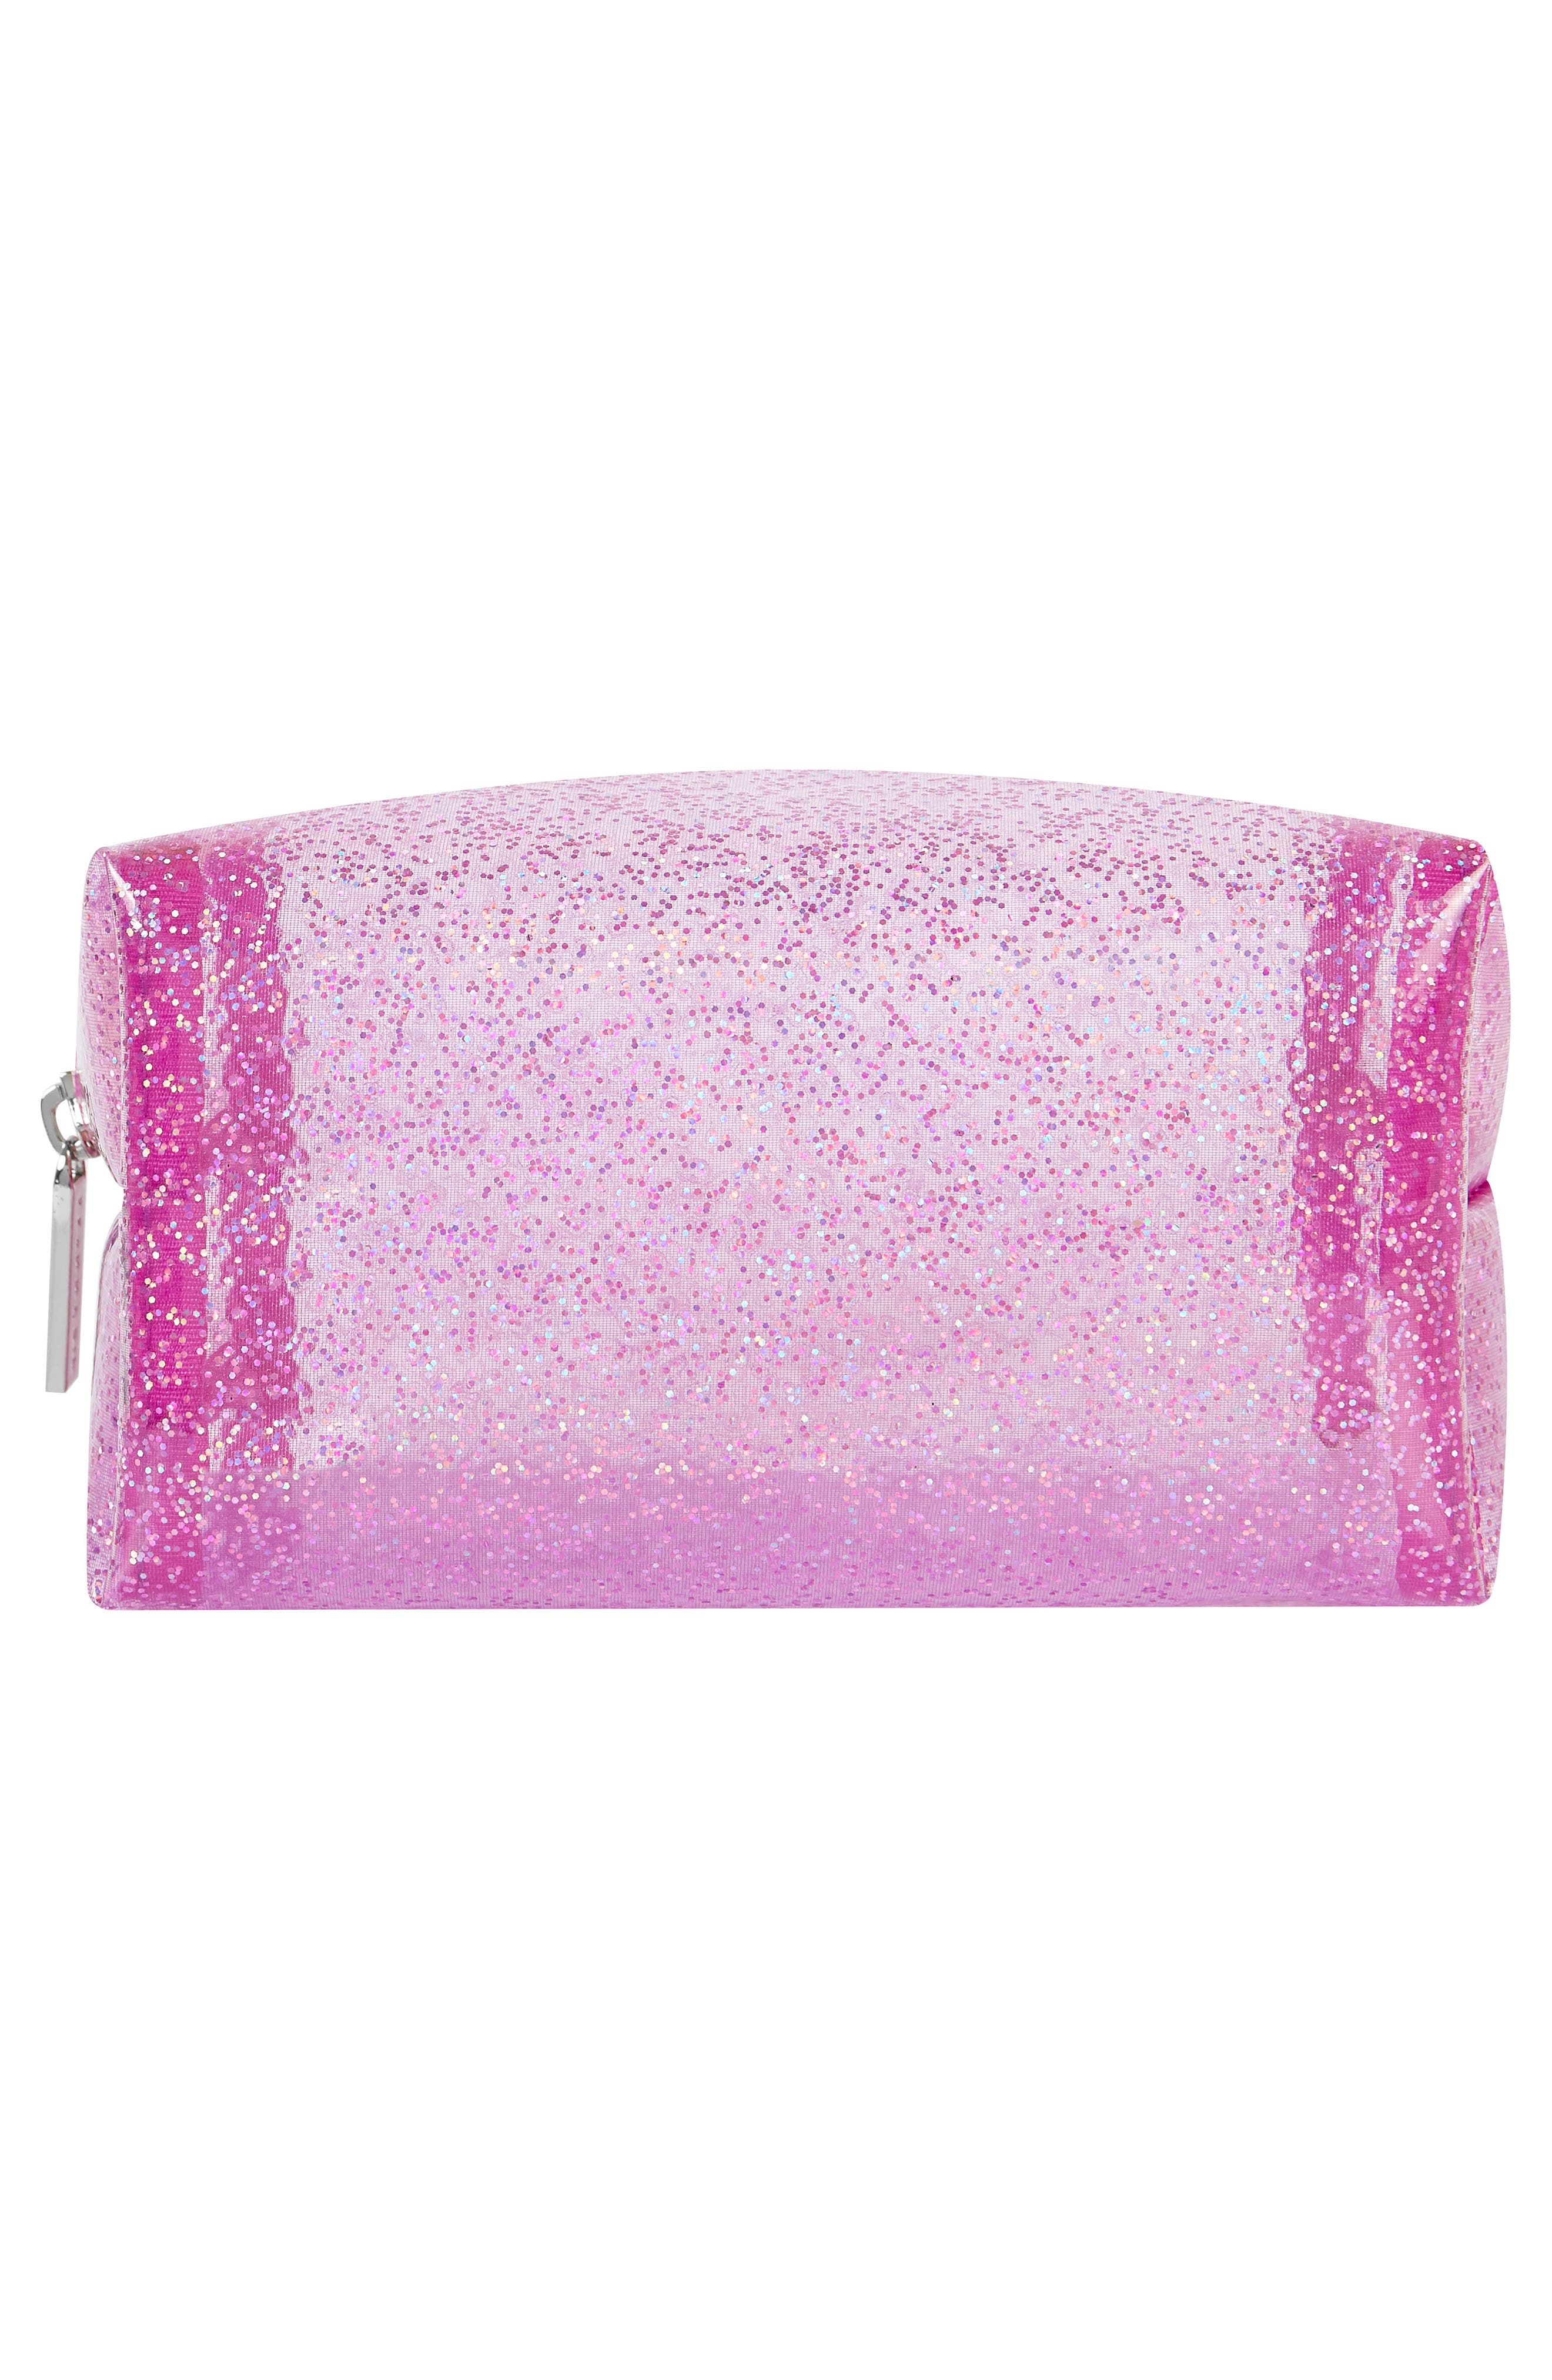 Glitter Bomb Makeup Bag,                             Alternate thumbnail 2, color,                             NO COLOR